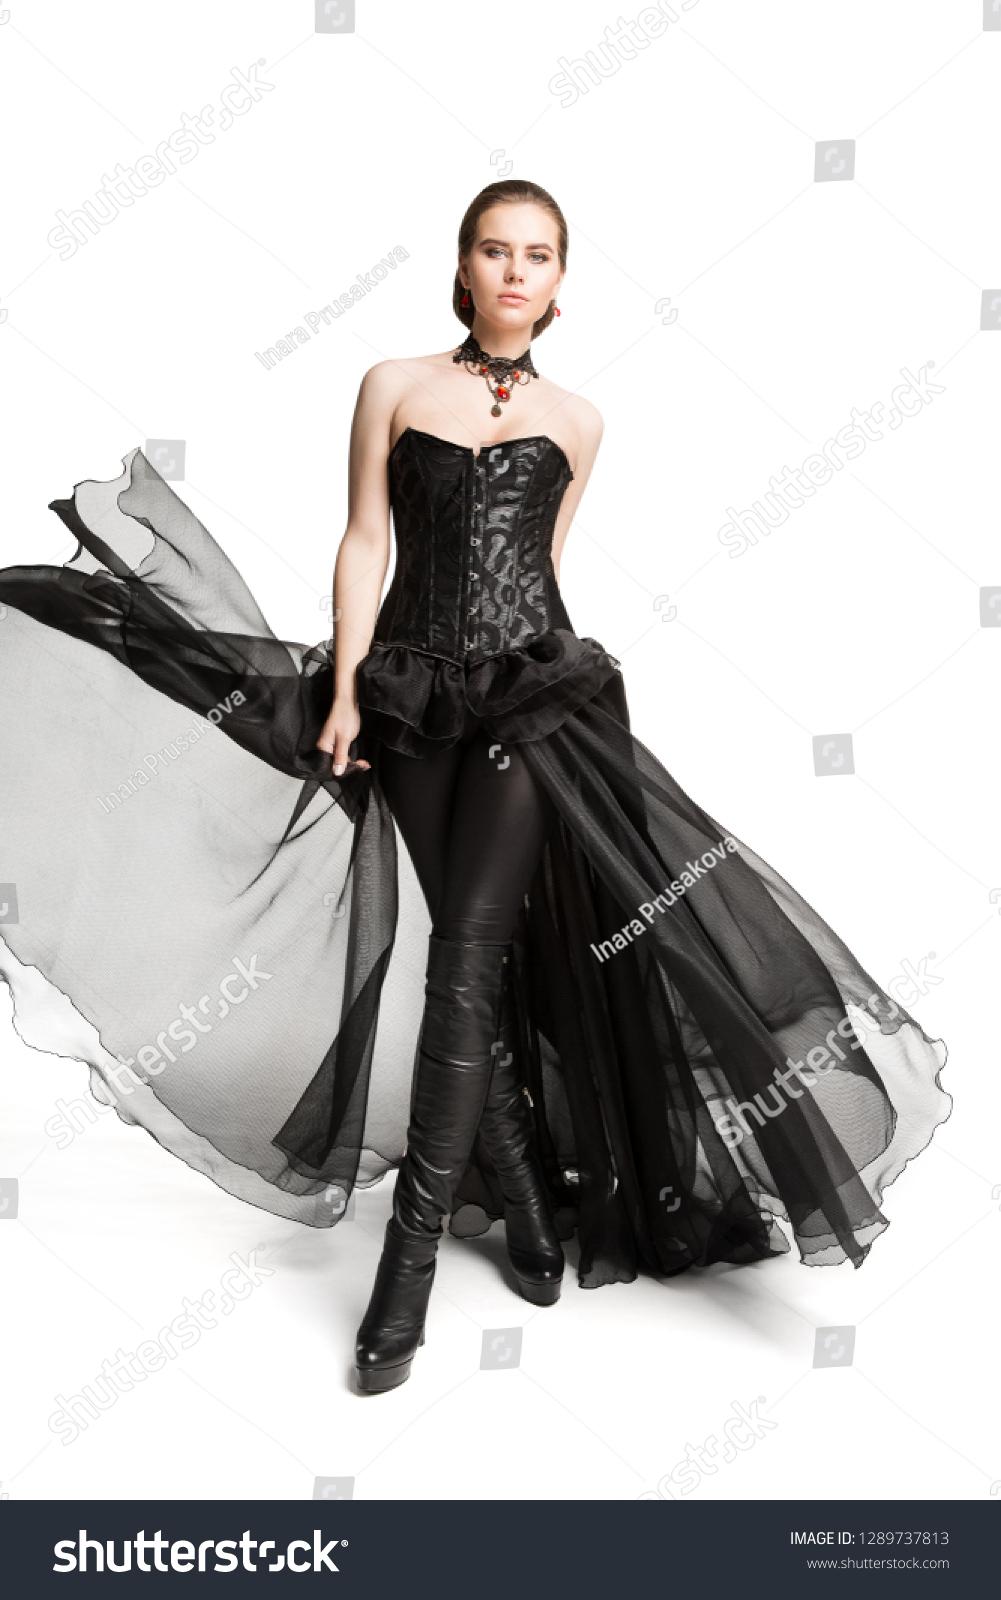 Fashion Model Black Corset Dress Leather Stock Photo Edit Now 1289737813